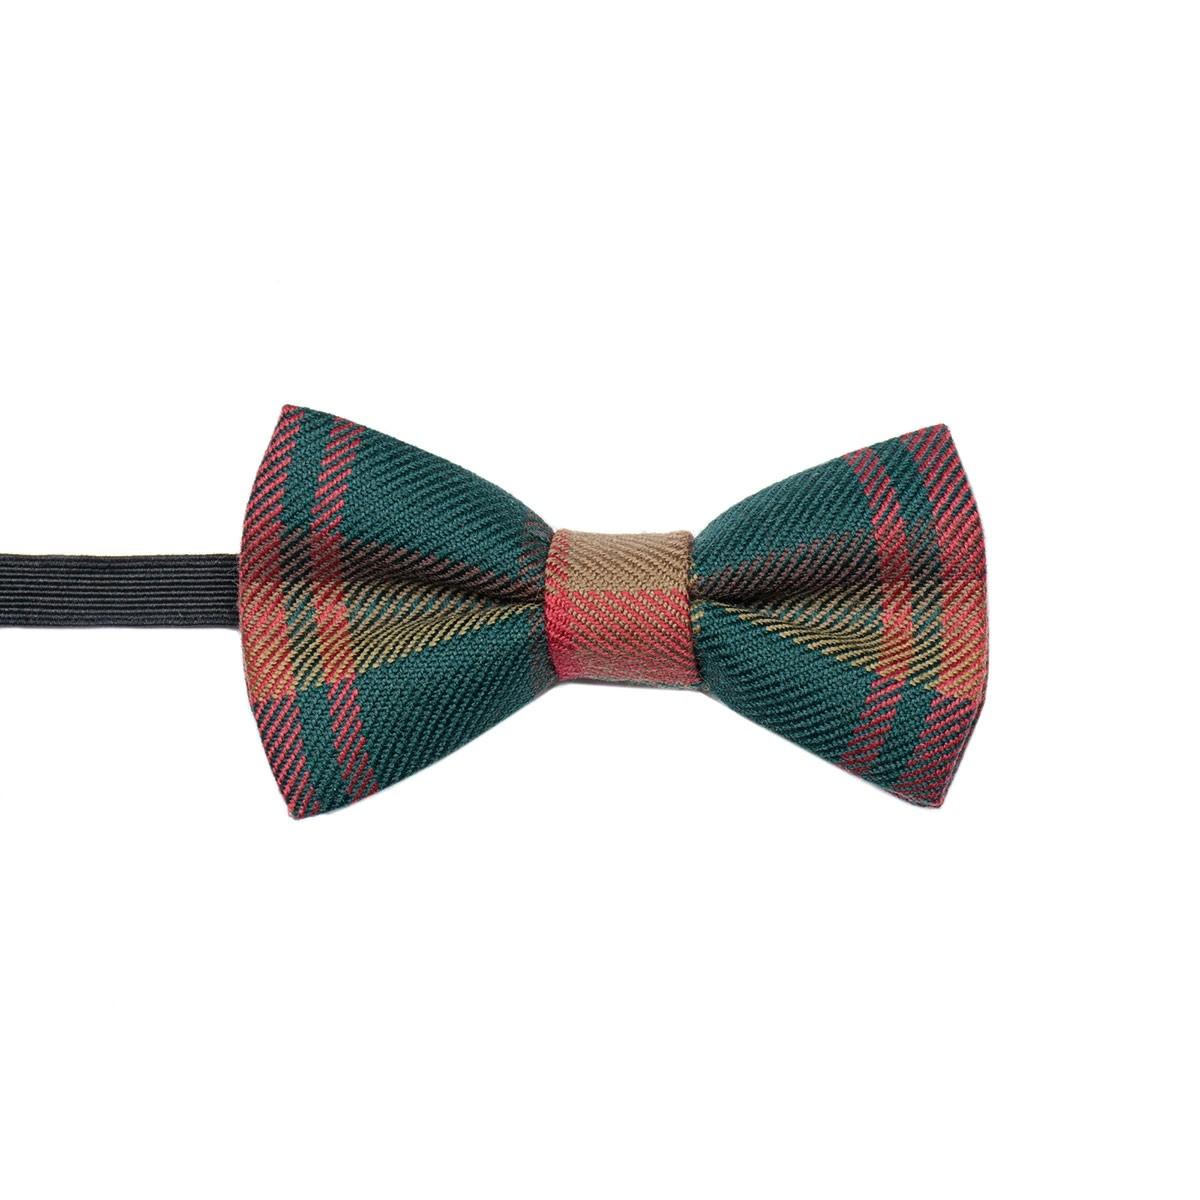 Made to Order Reiver Lightweight Boys / Childrens Tartan Bow Tie